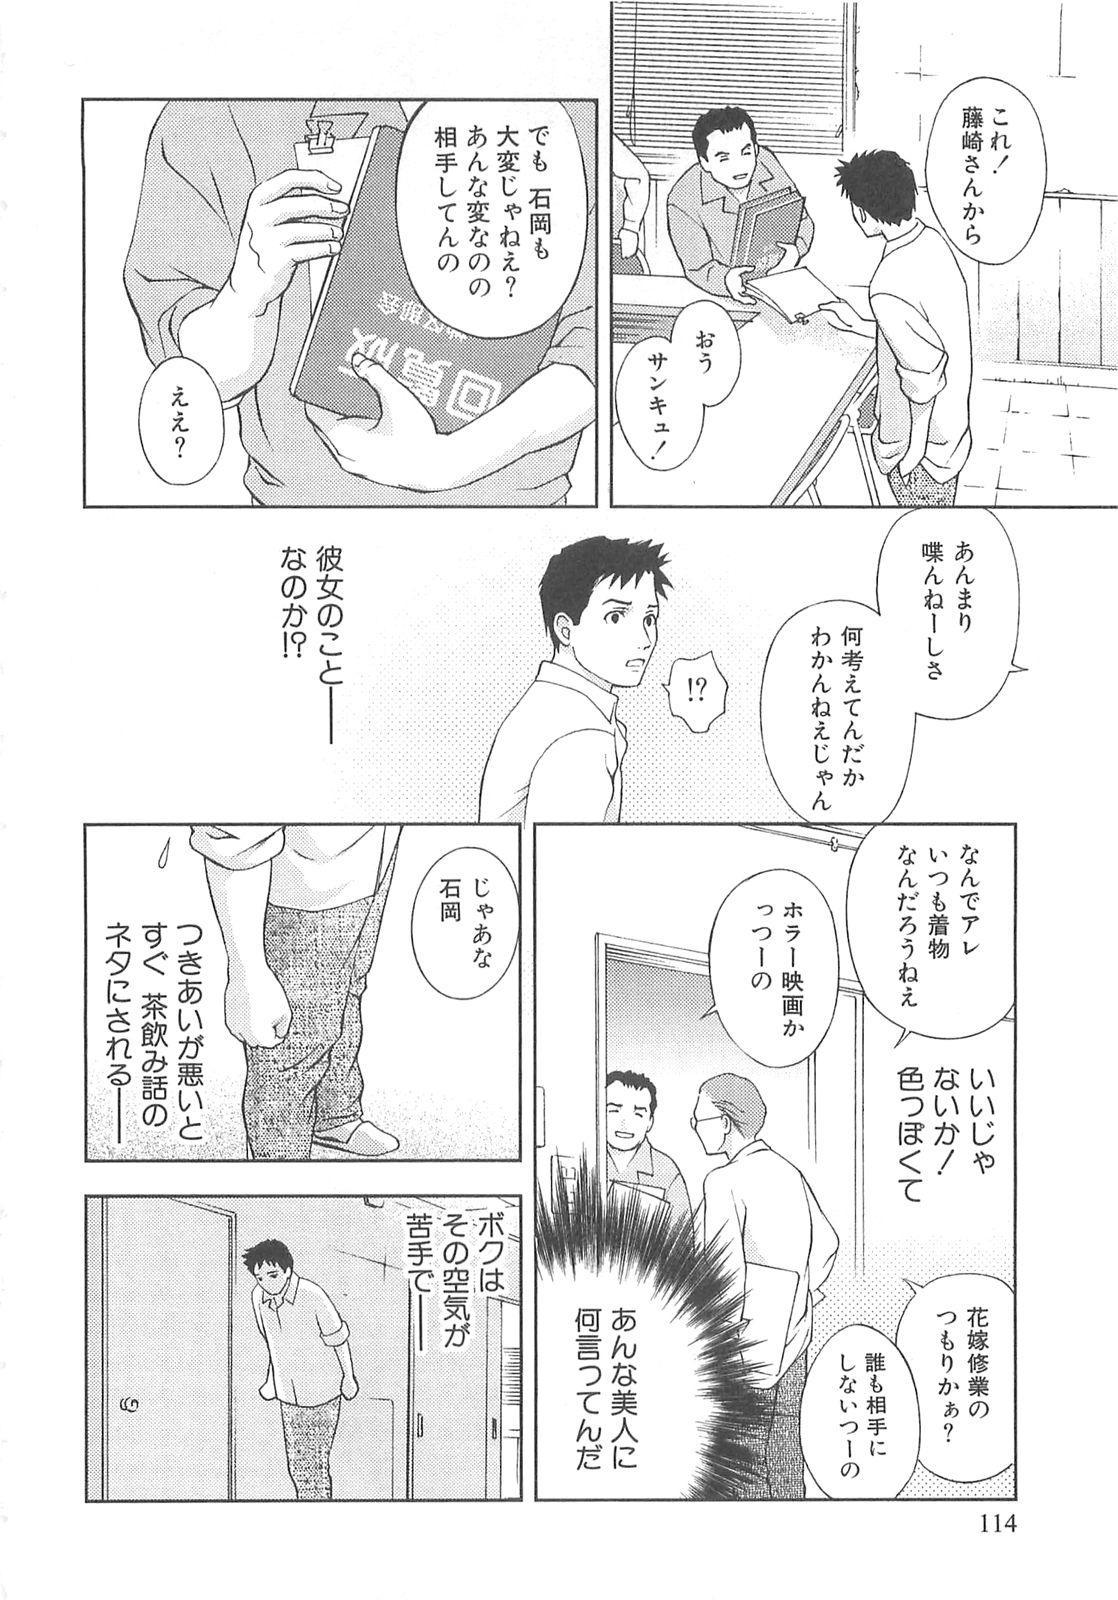 Tenshi no Kyuu - Angel's Pretty Hip 114